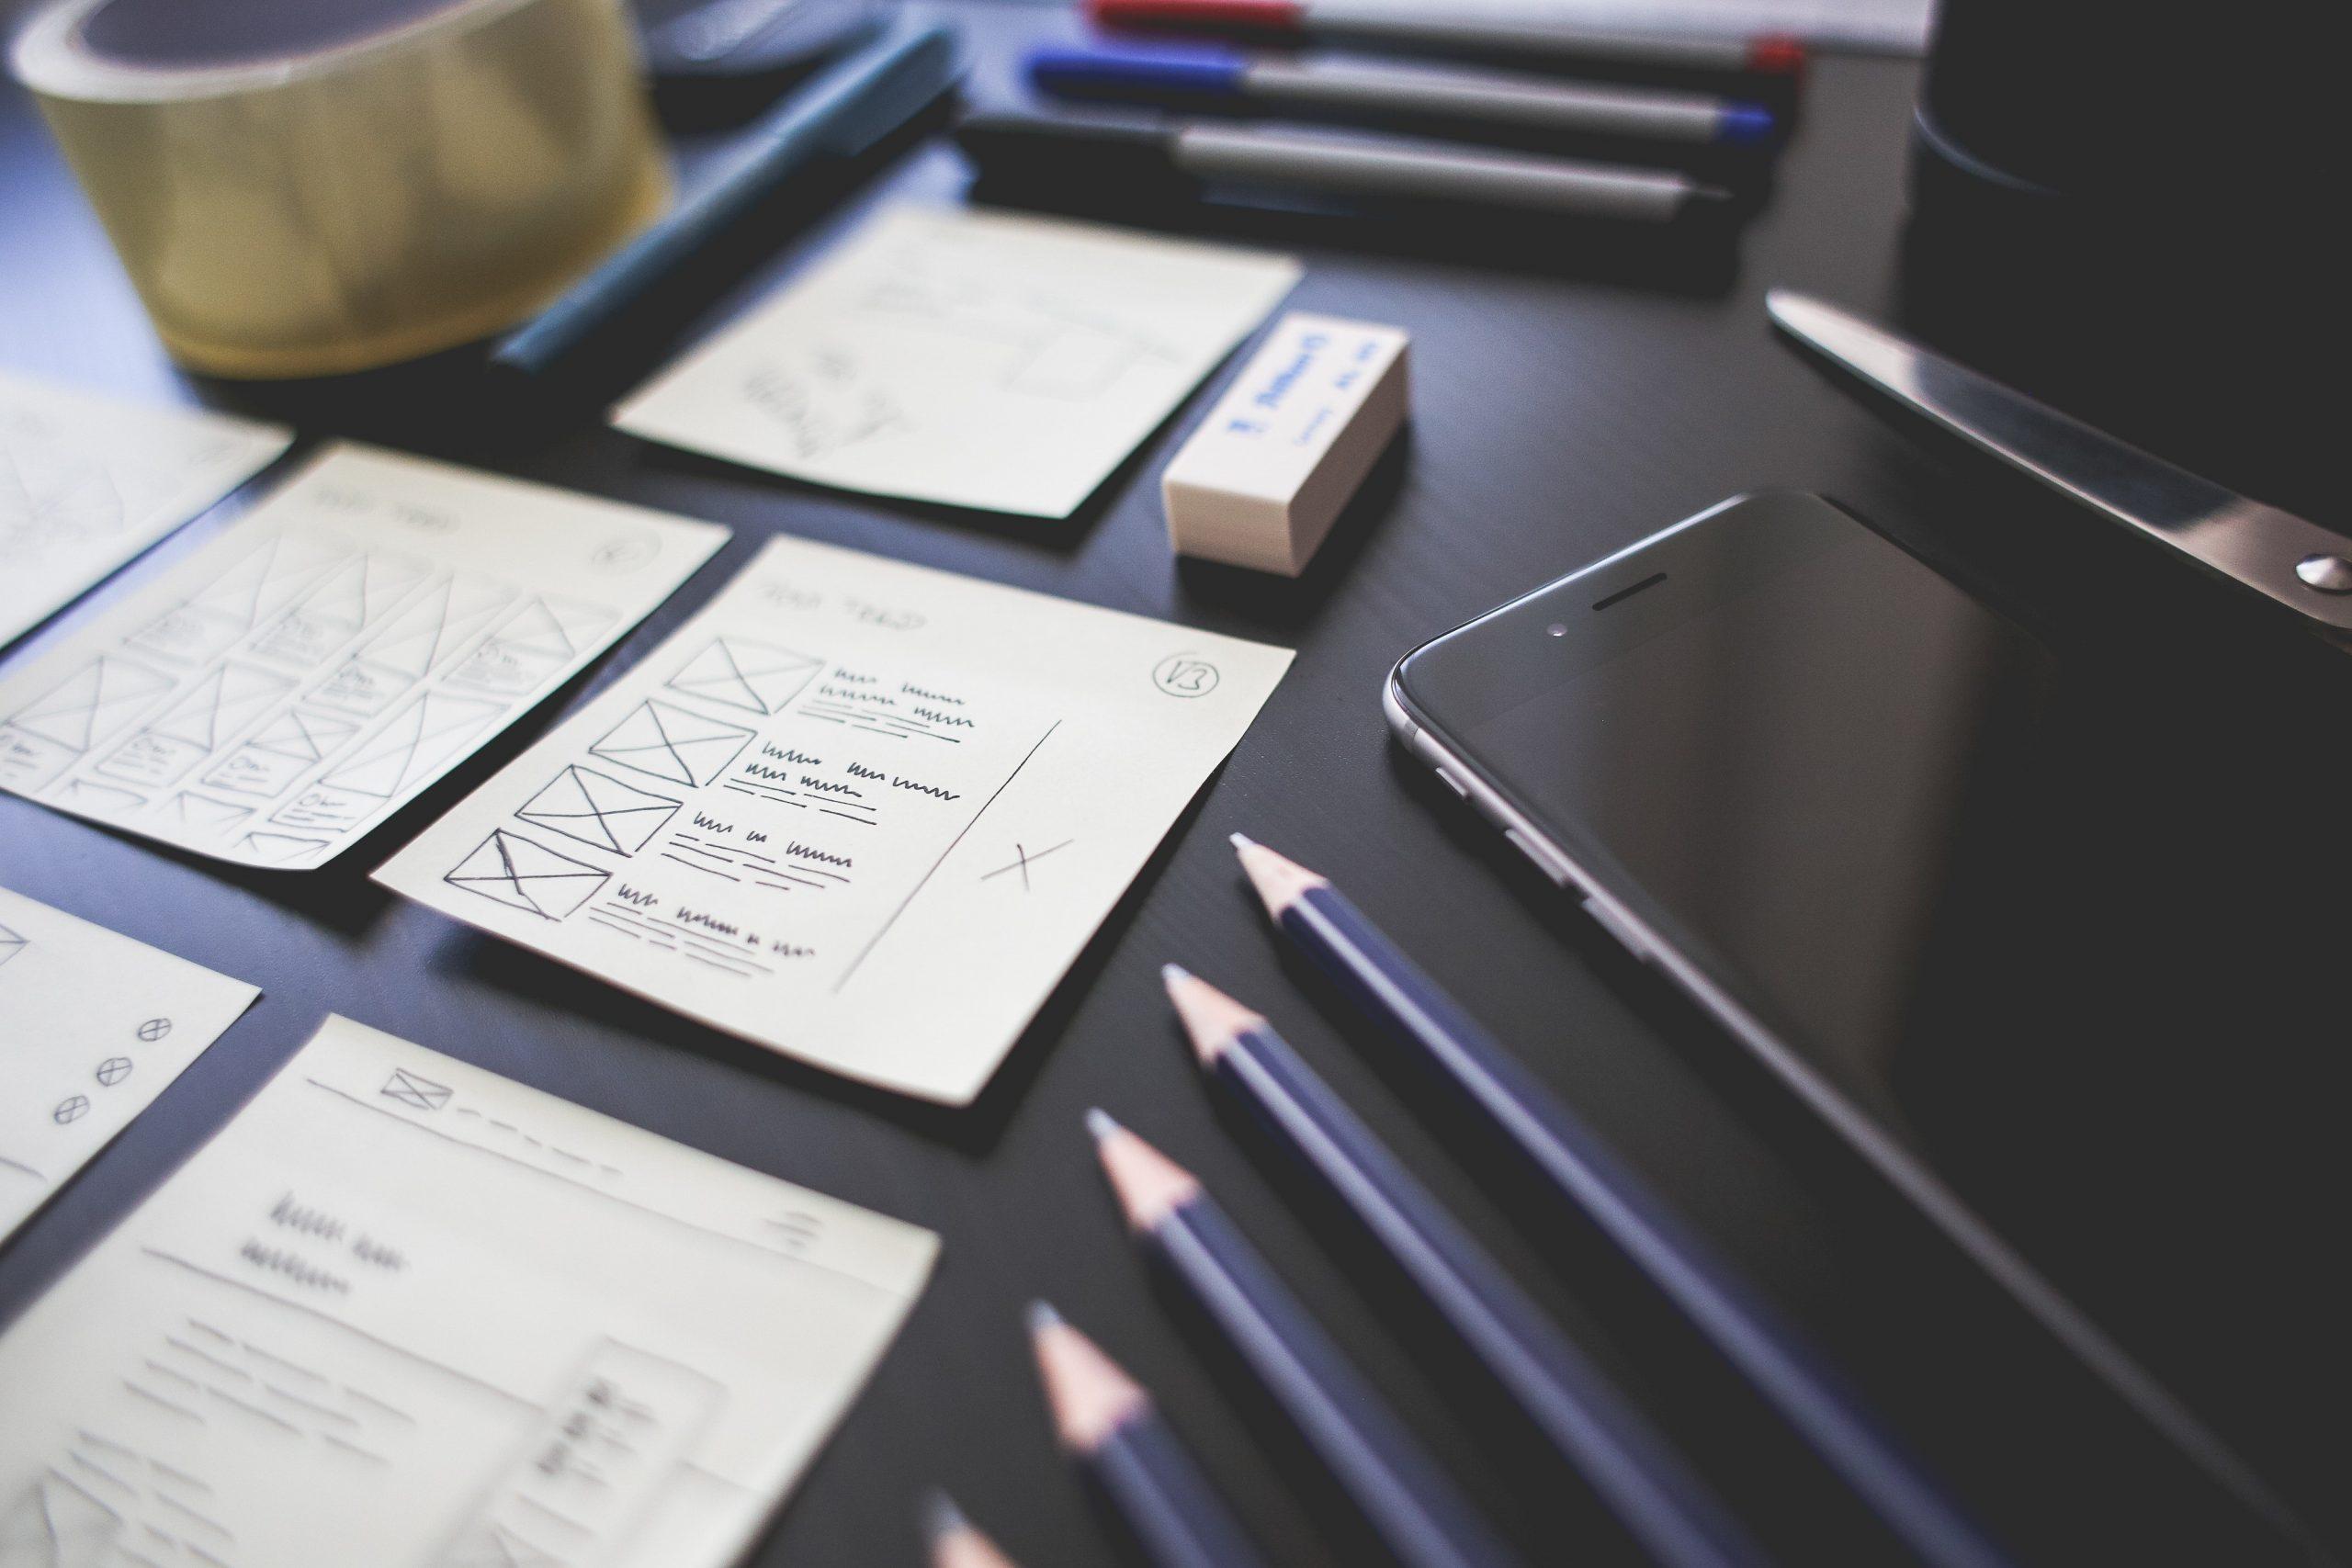 Empresa organizando os modelos de planejamento